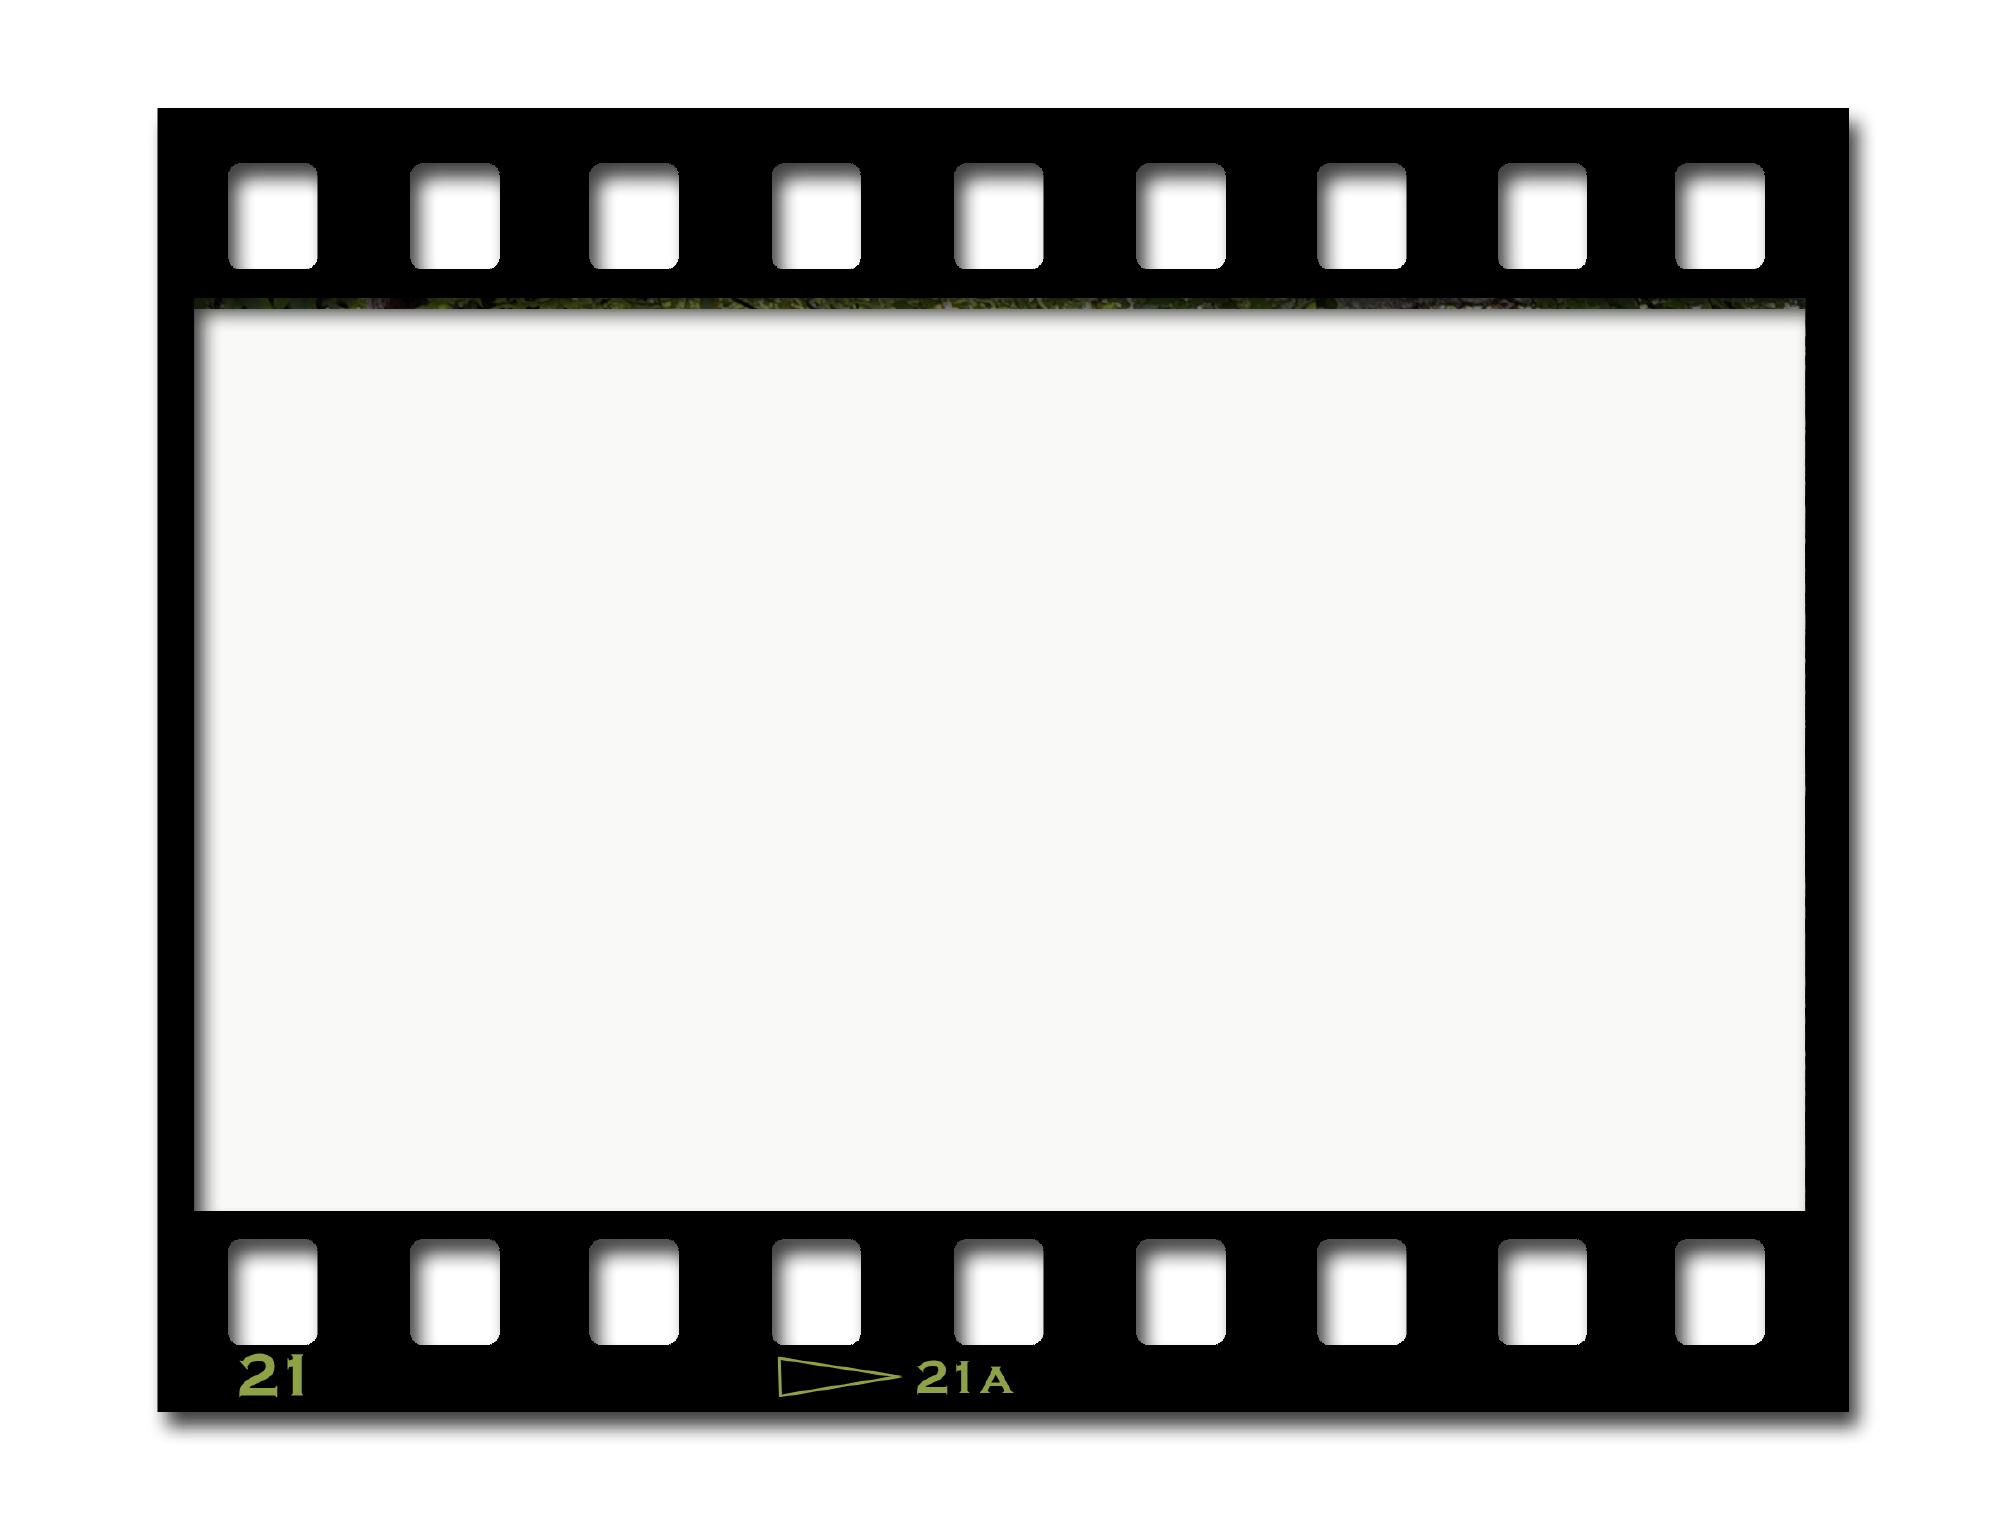 2000x1533 Movie Reel Movie Film Strip Clip Art Image 3